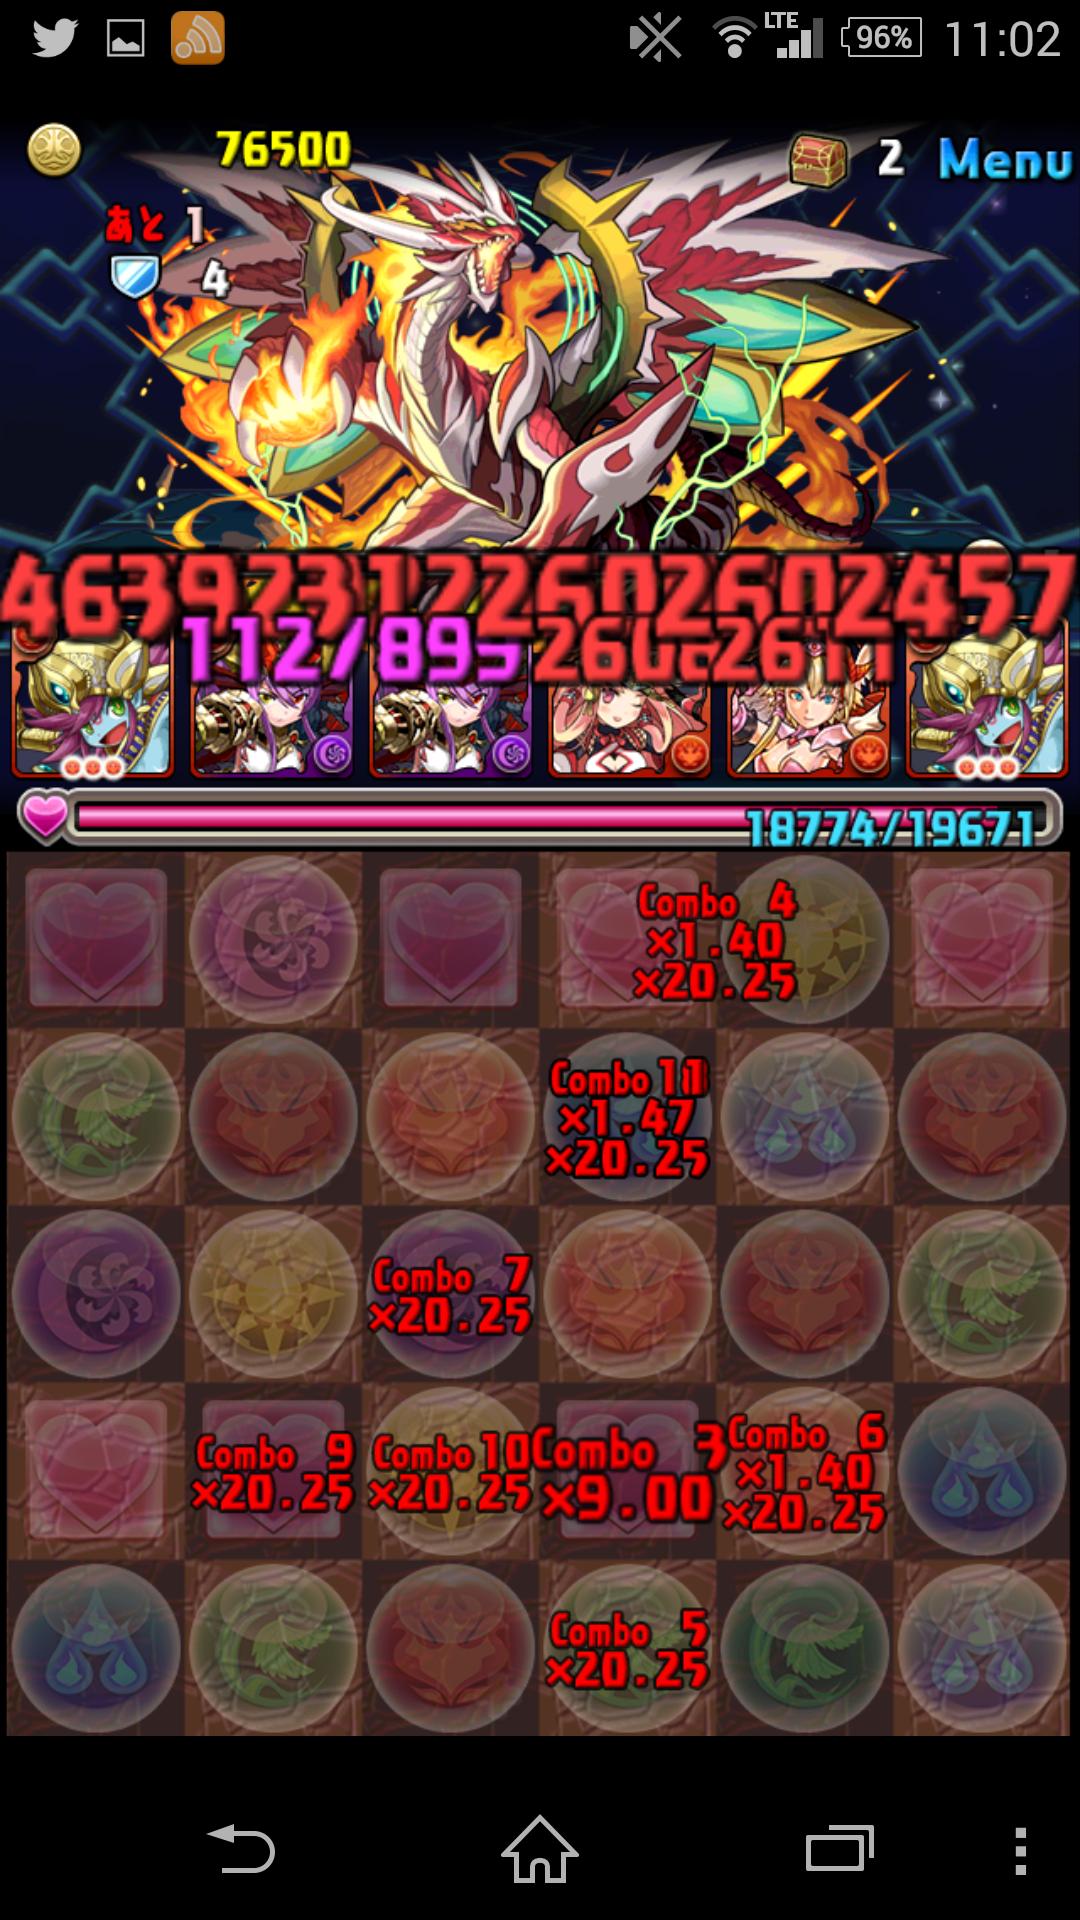 Screenshot_2015-01-17-11-02-11.png